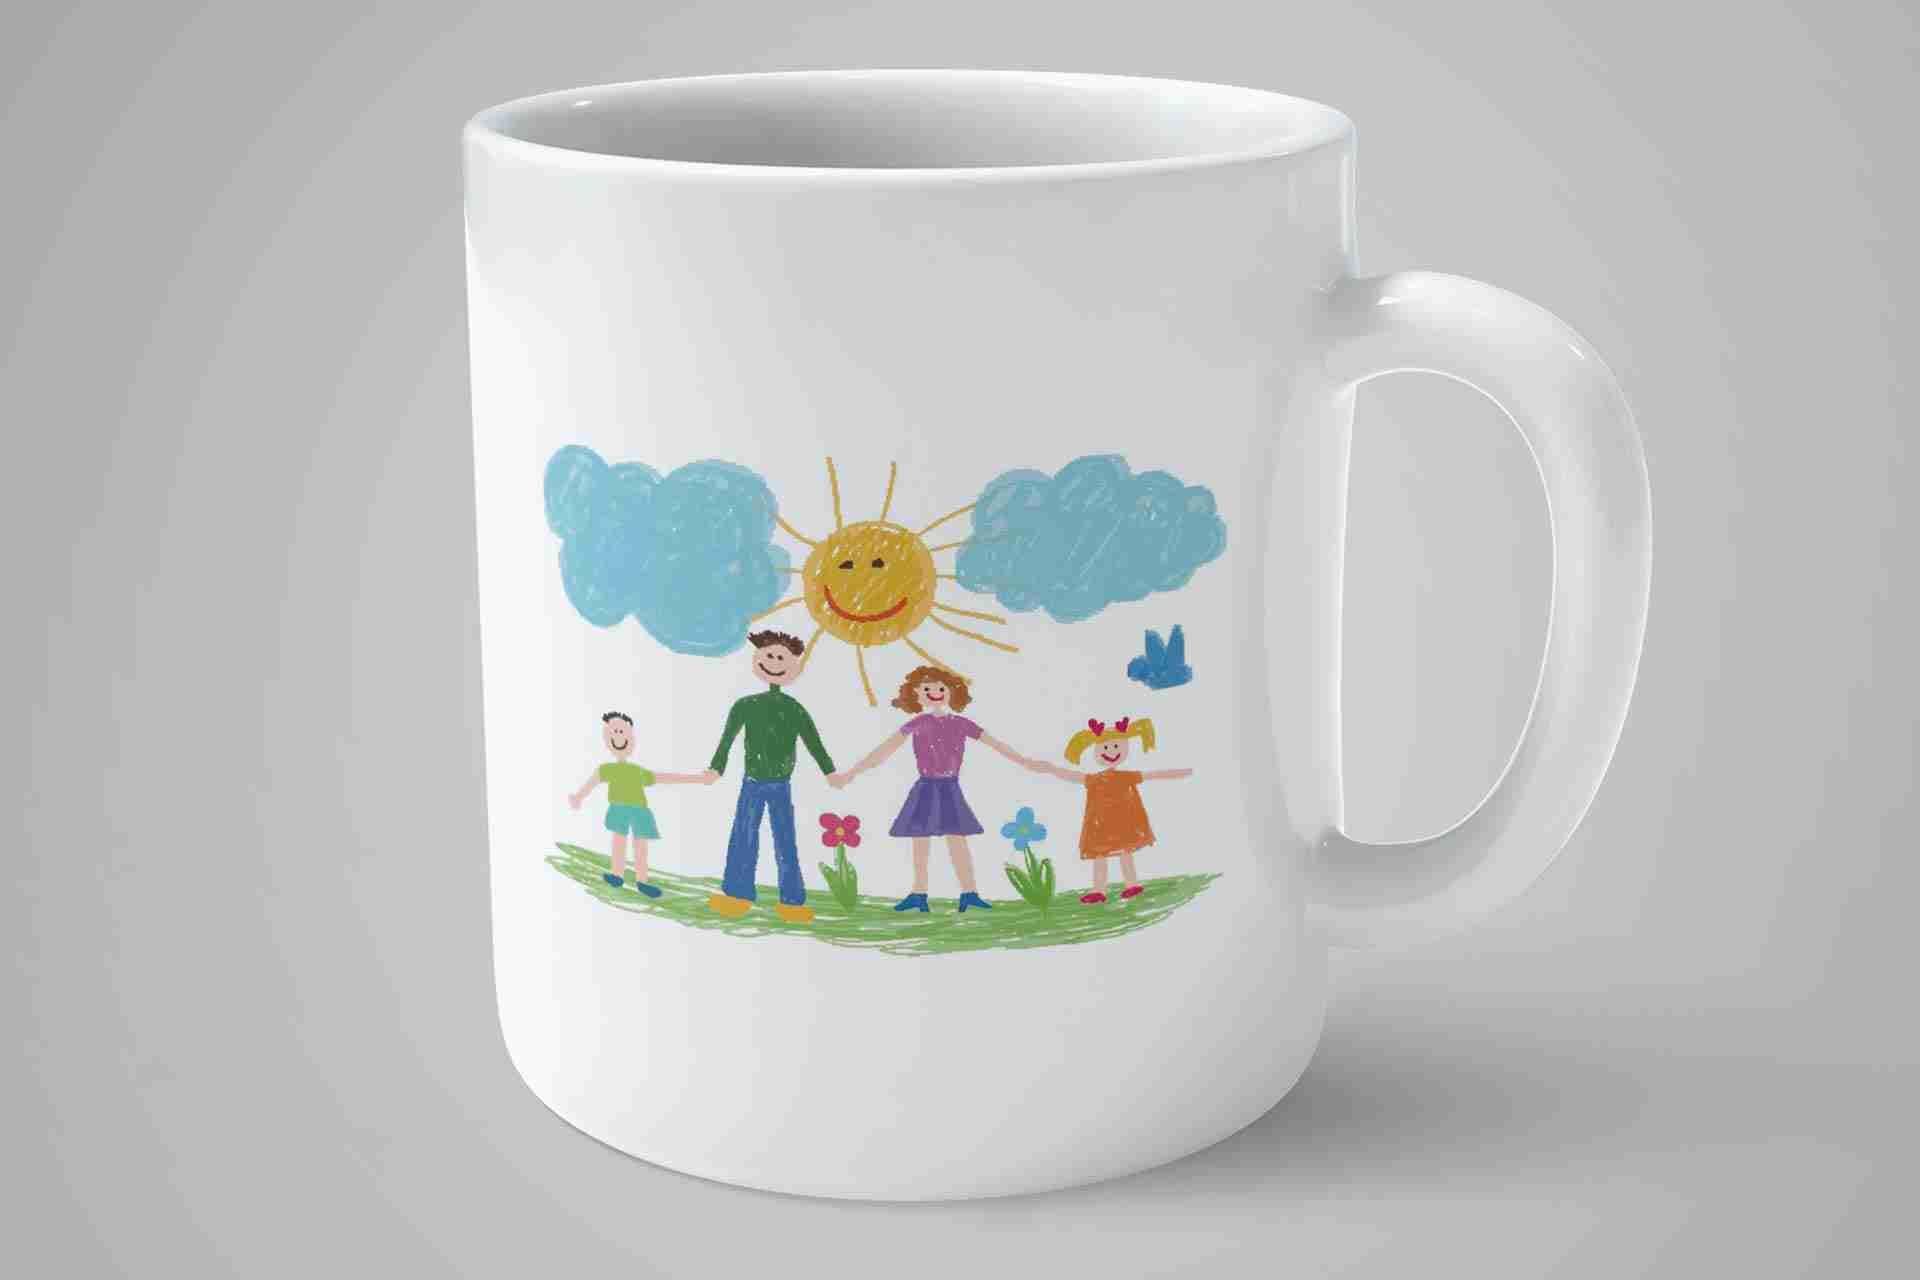 schools-products-MASTER_0005_Mug-MockUp_1